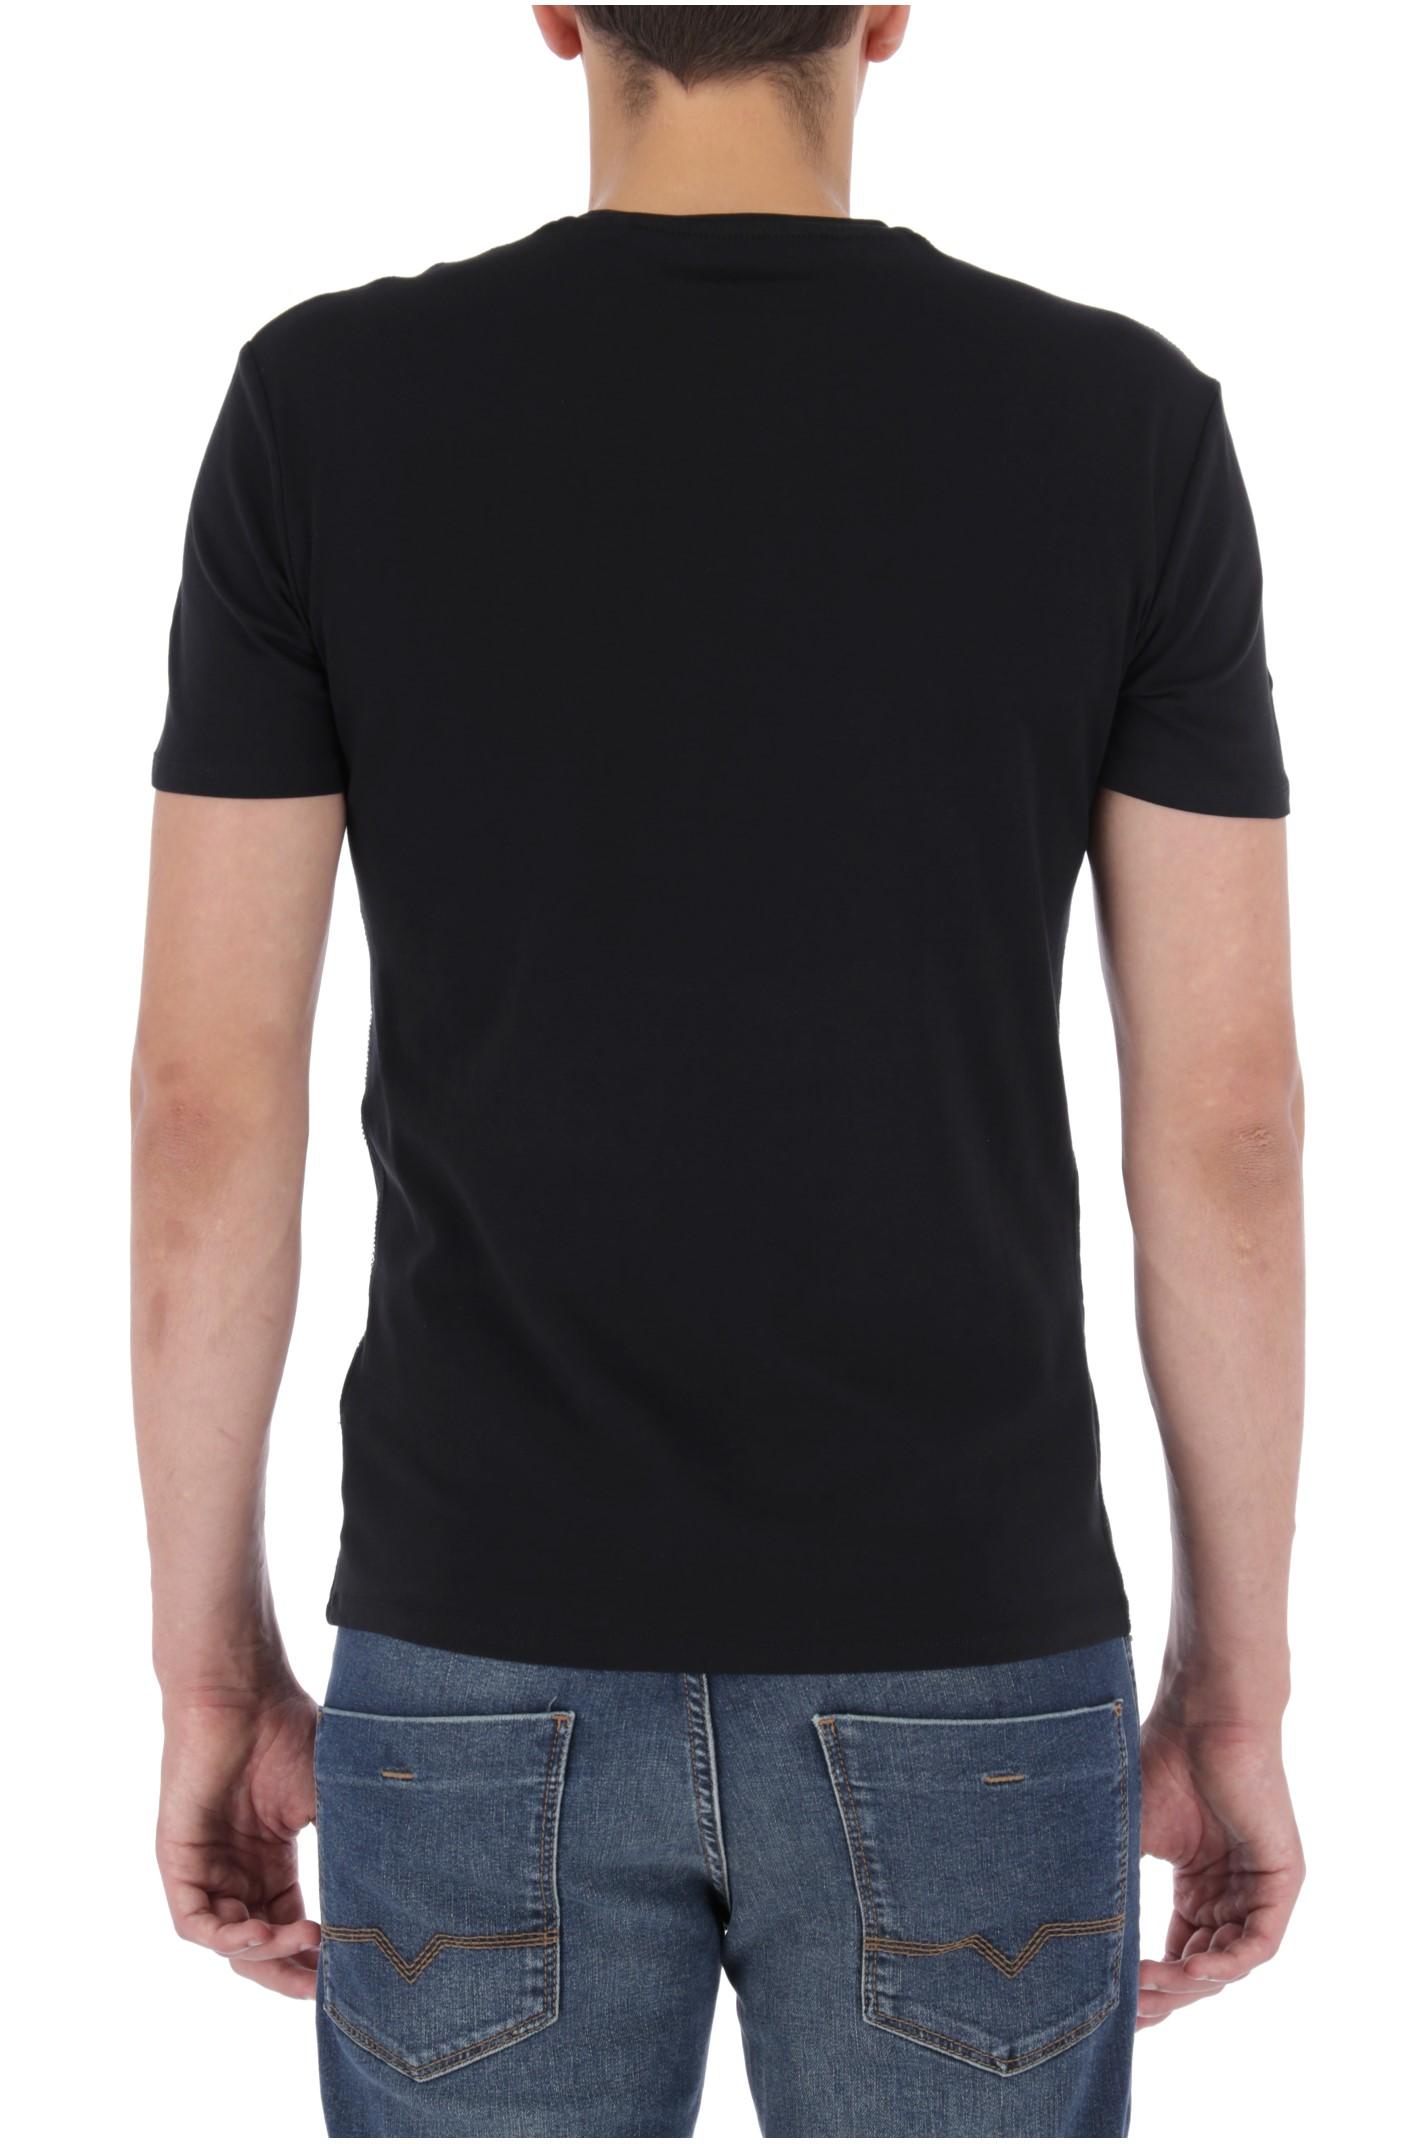 T-shirt super slim GUESS | T-shirt | M84I73 J1300JBLK